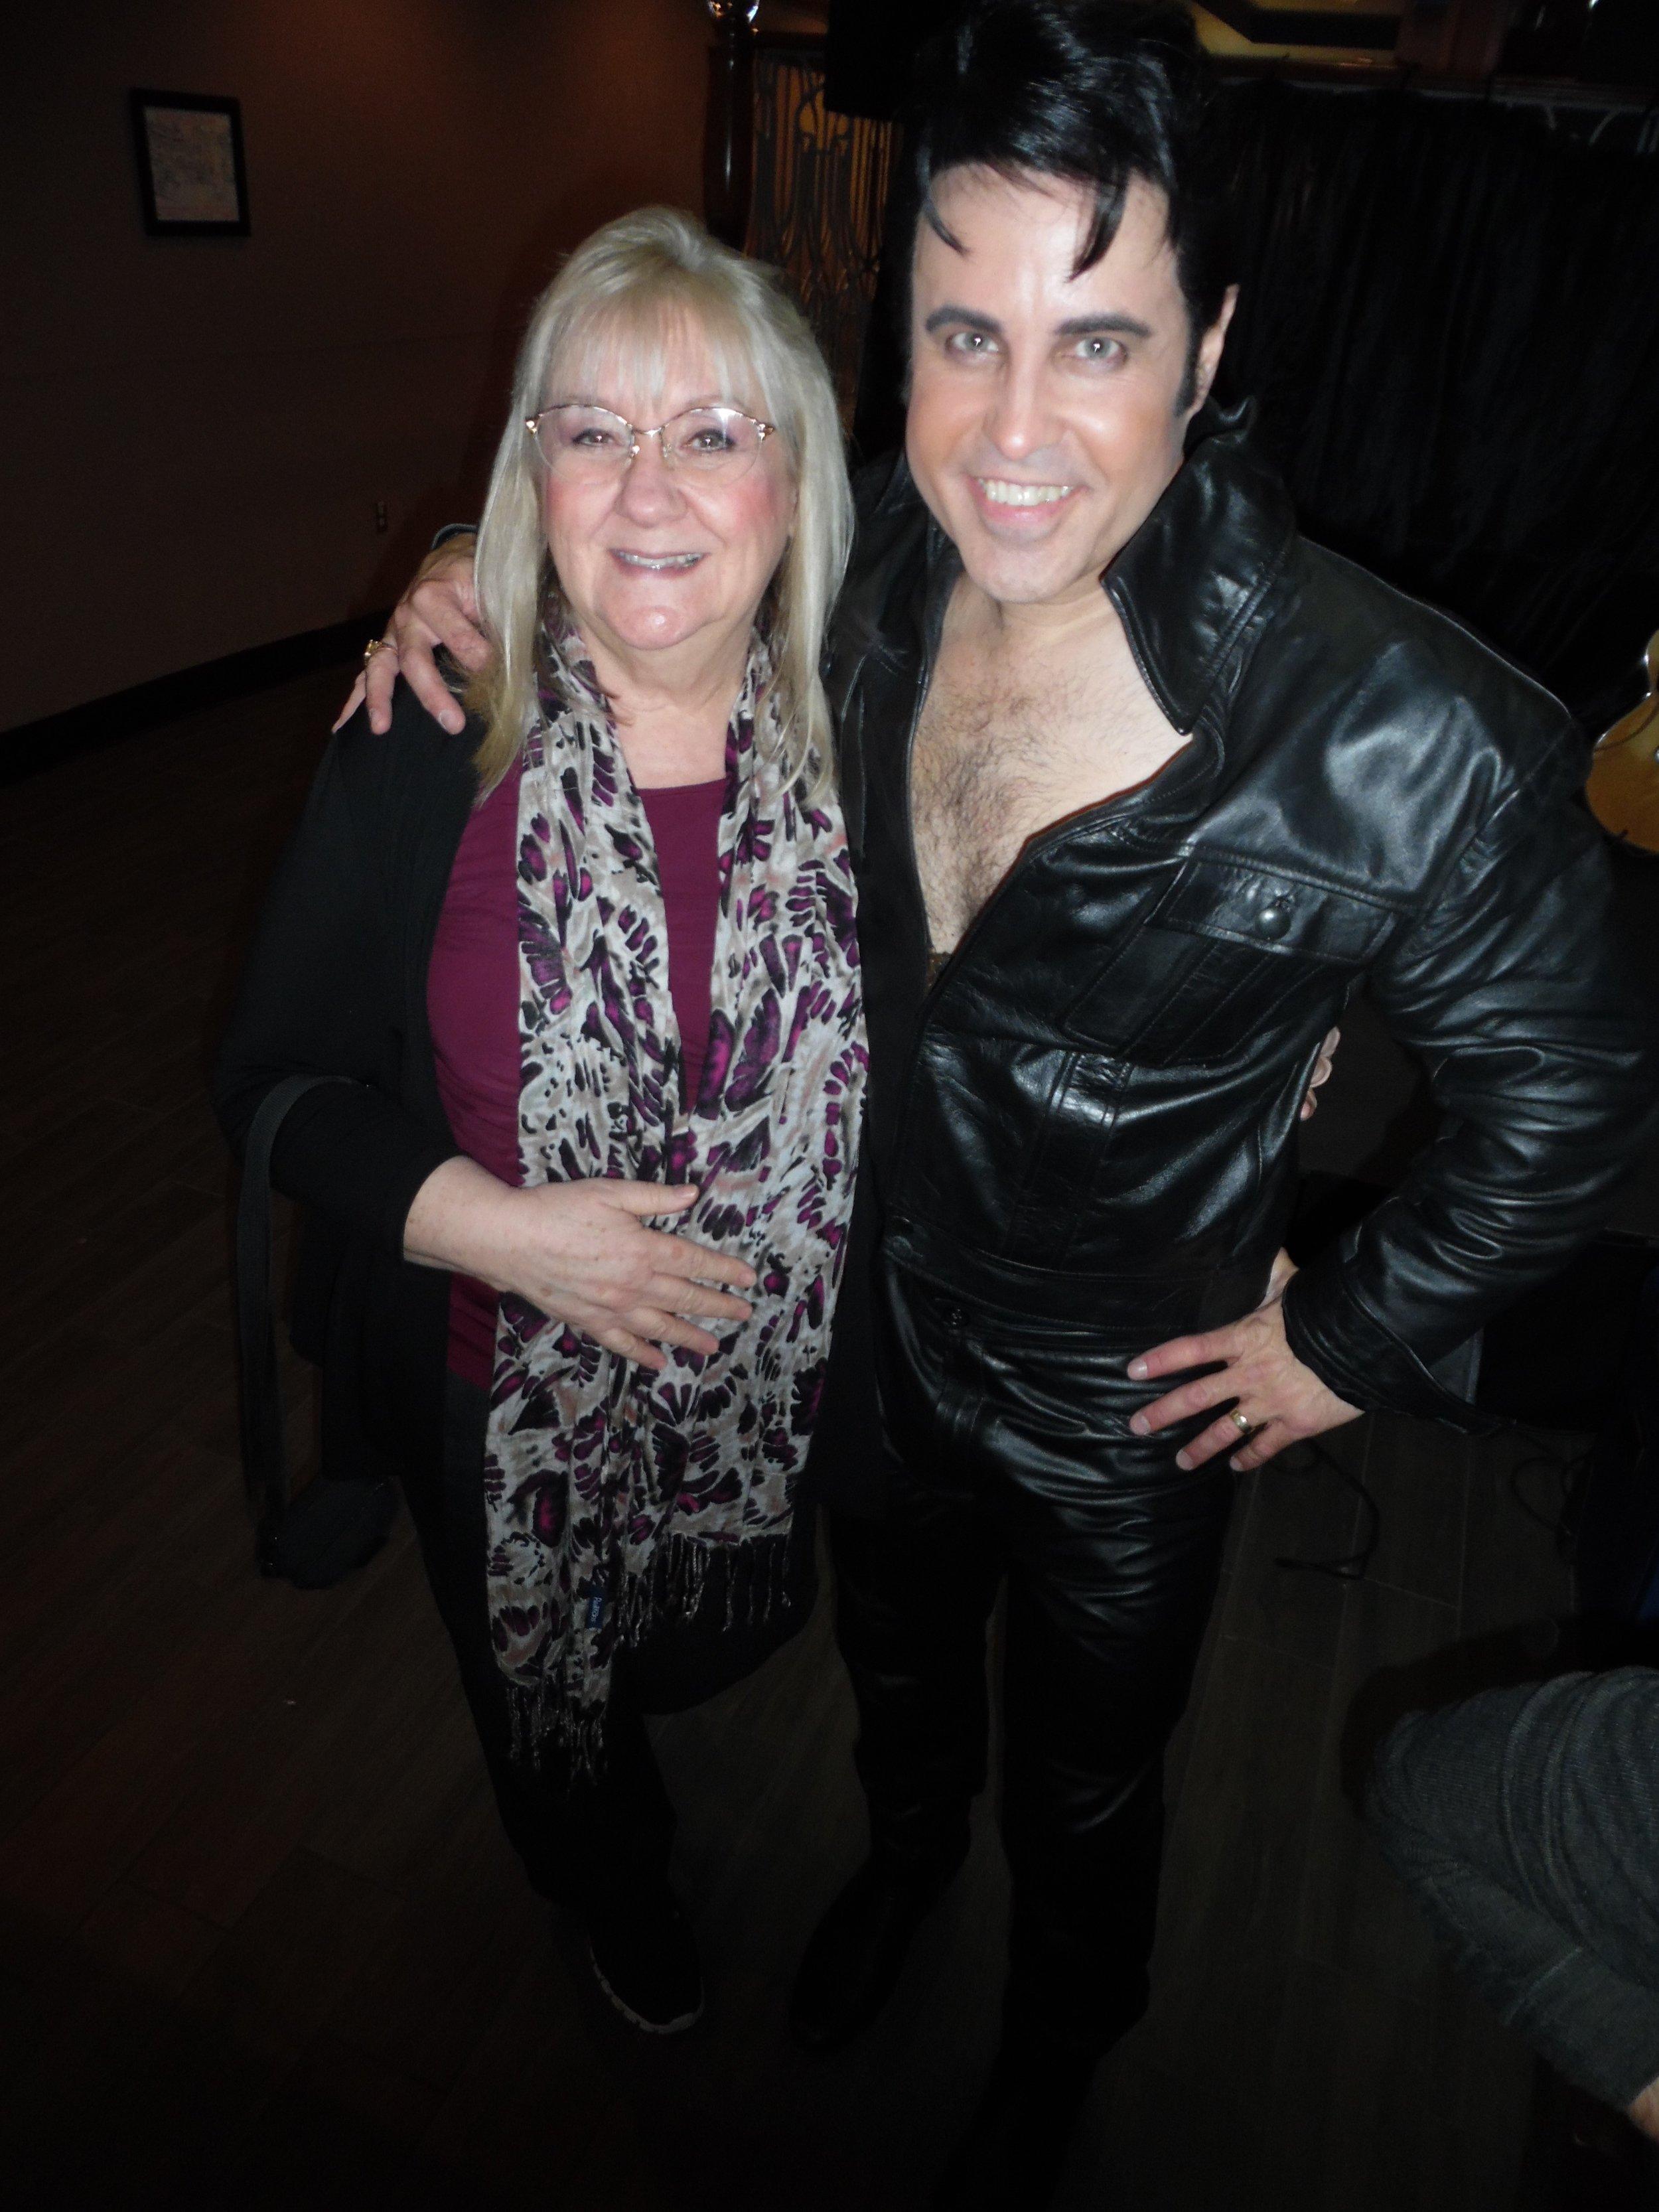 SIBEBURNS Magazine editor, Carolyn MacArthur, with ETA  James Gibb , March 16th, 2018, at Flamboro Downs.